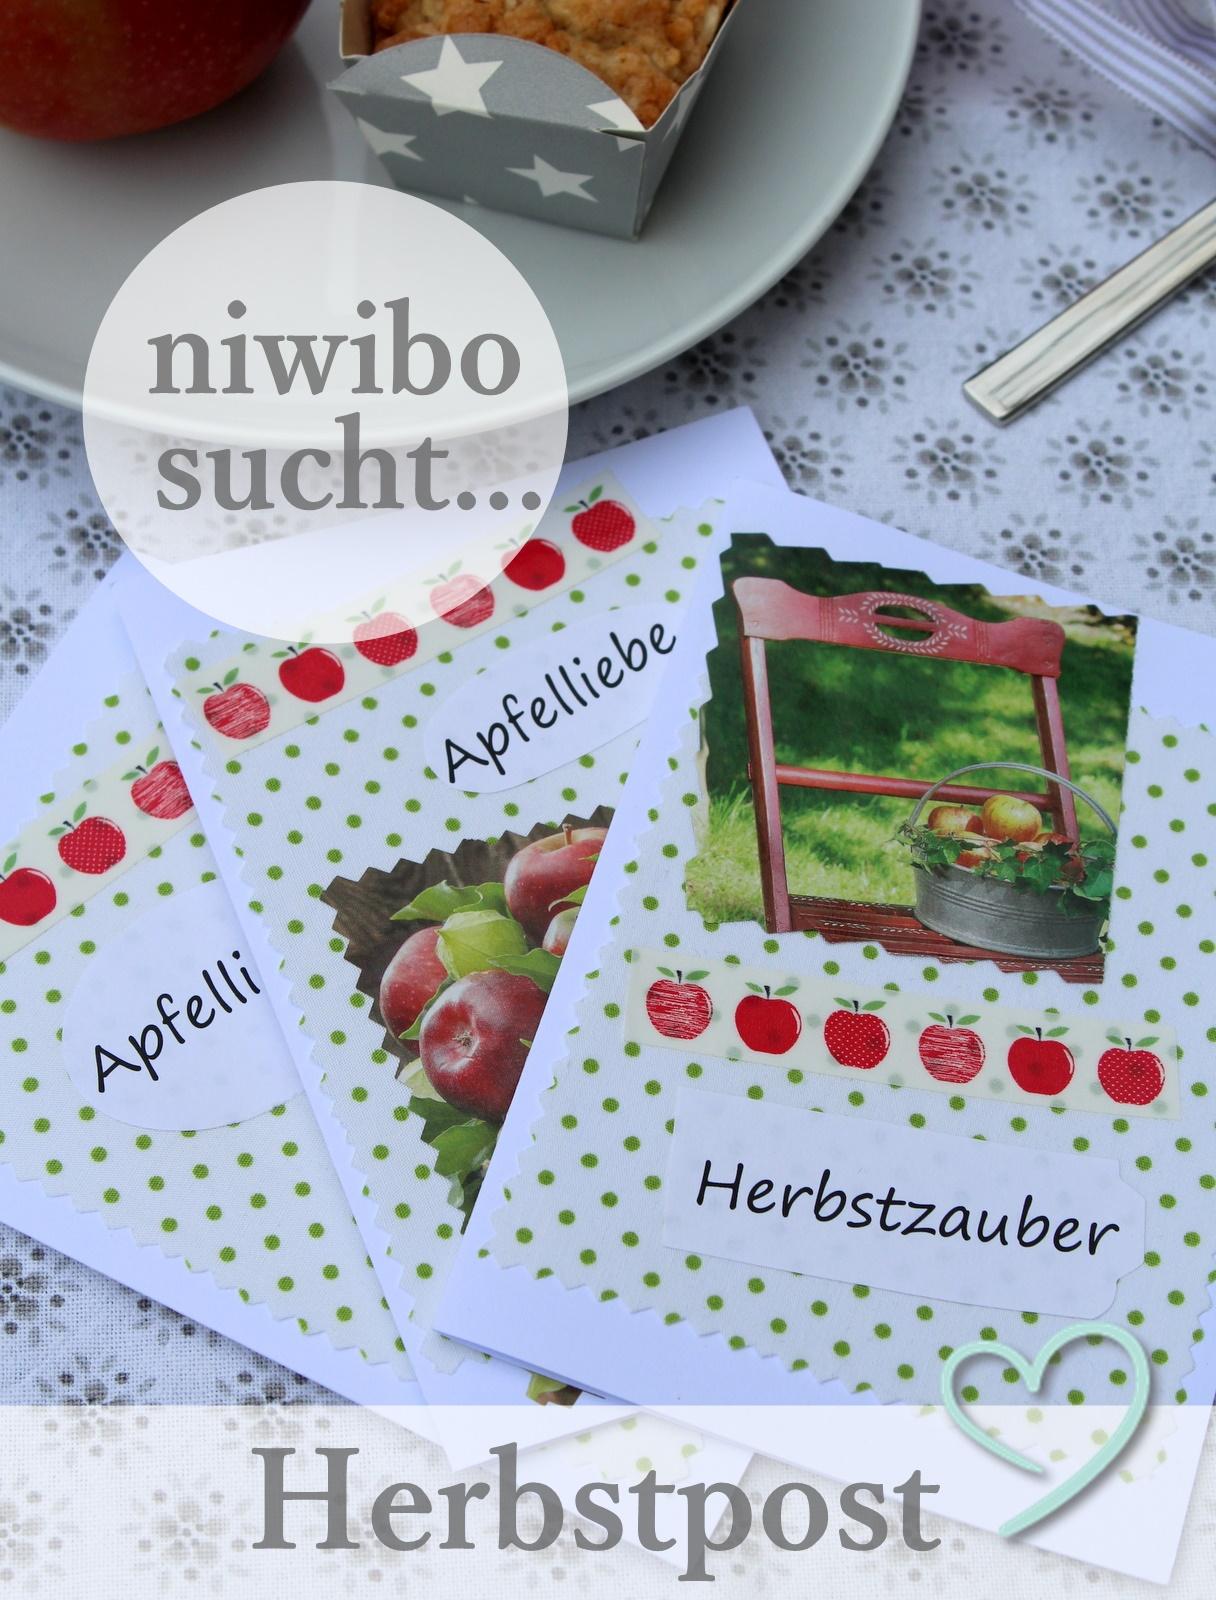 niwibo sucht...